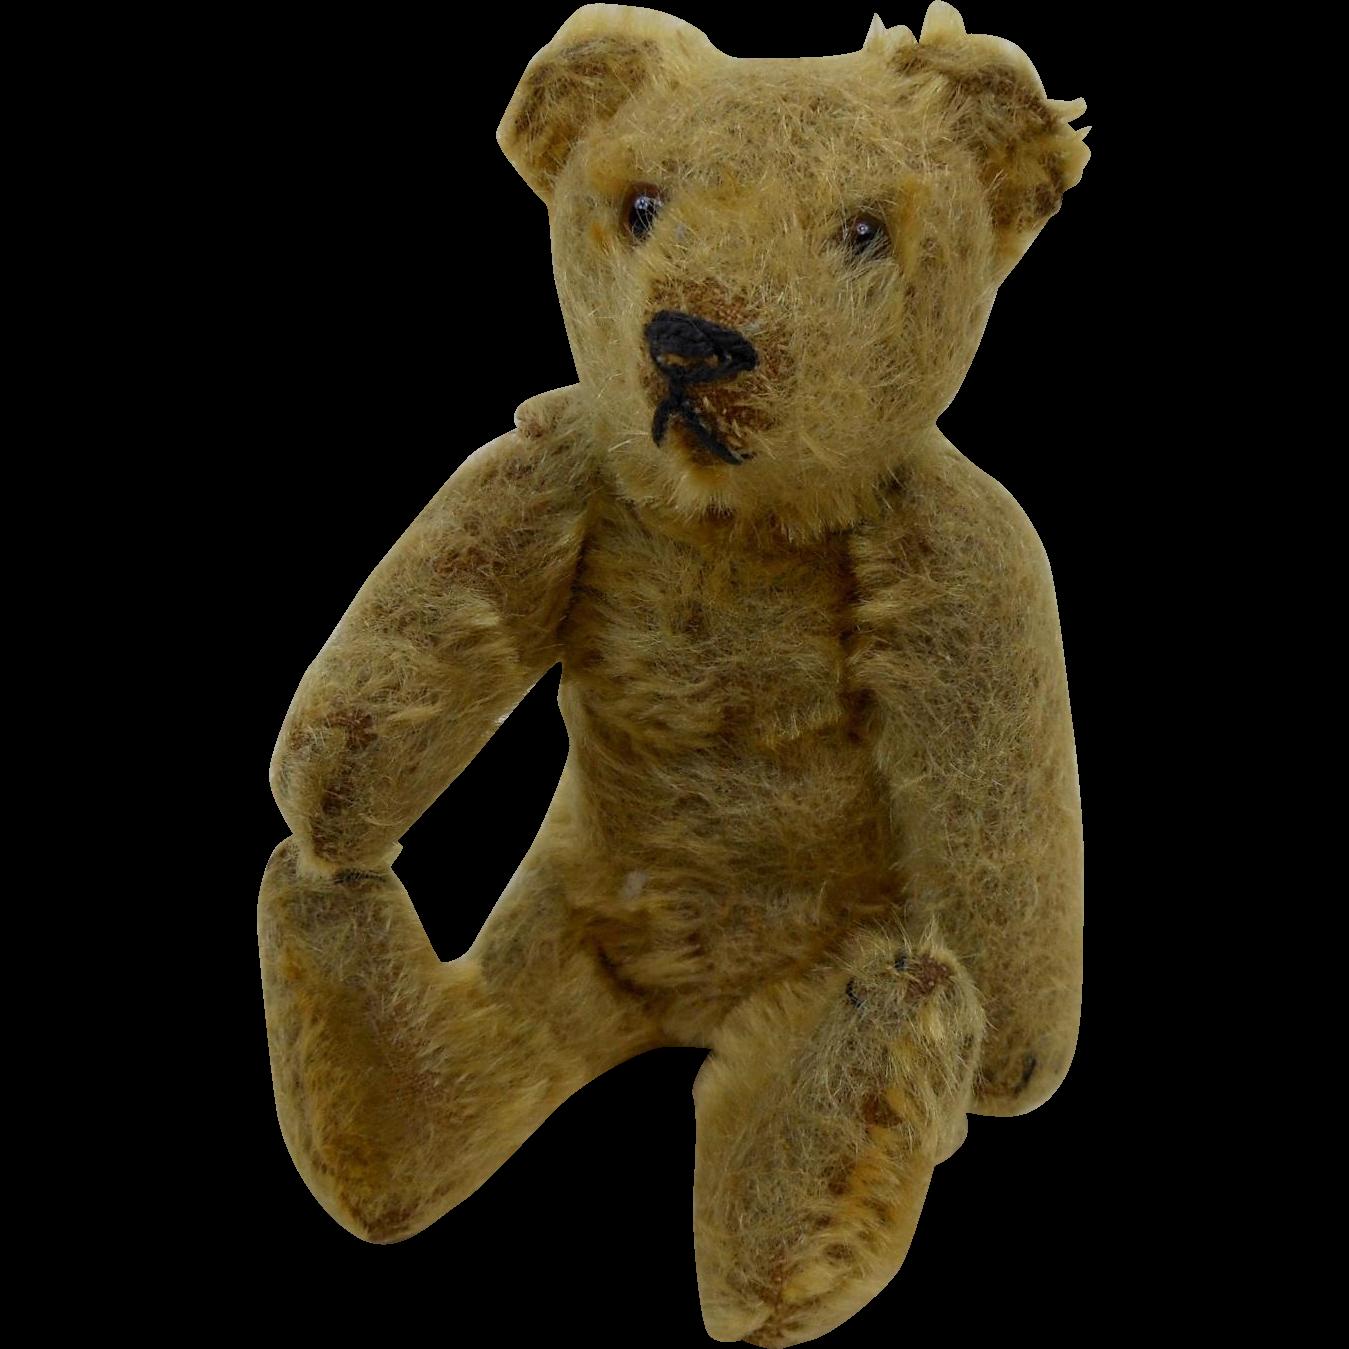 C. Henry Kempe's Teddy Bear